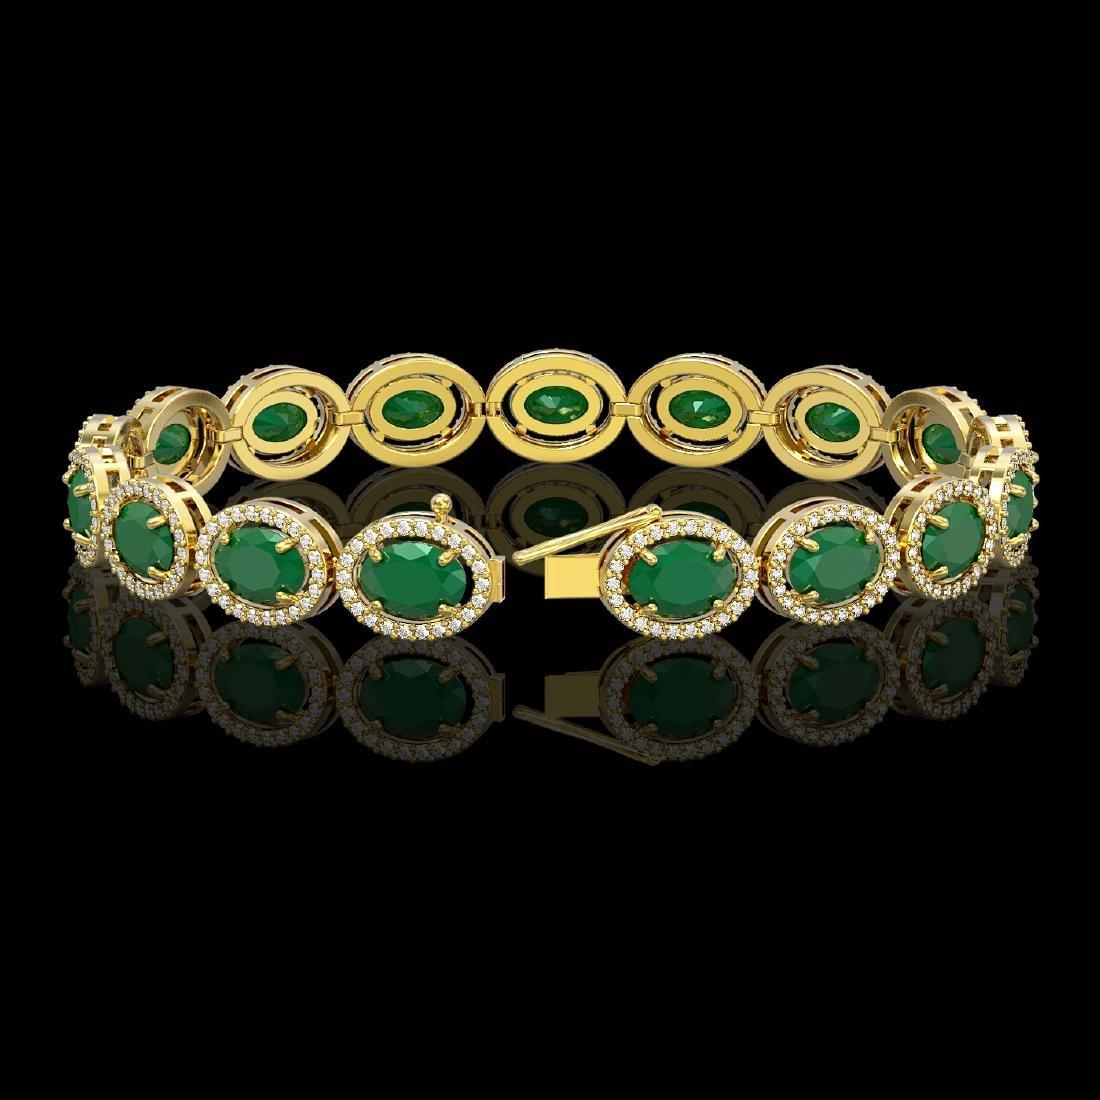 22.89 CTW Emerald & Diamond Halo Bracelet 10K Yellow - 2